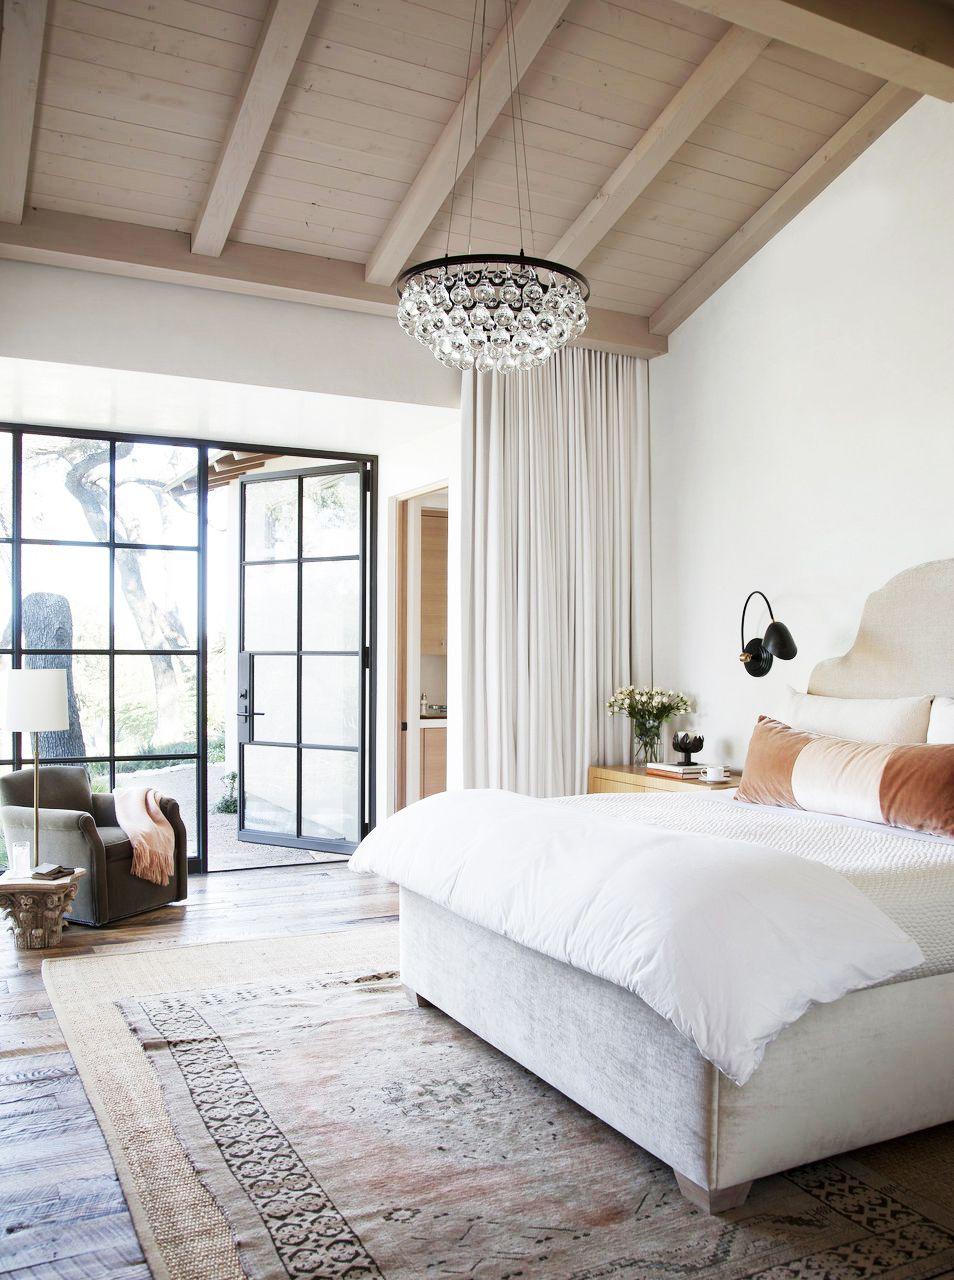 Vloerkleden layeren | Interieur | Pinterest - Vloerkleden ...